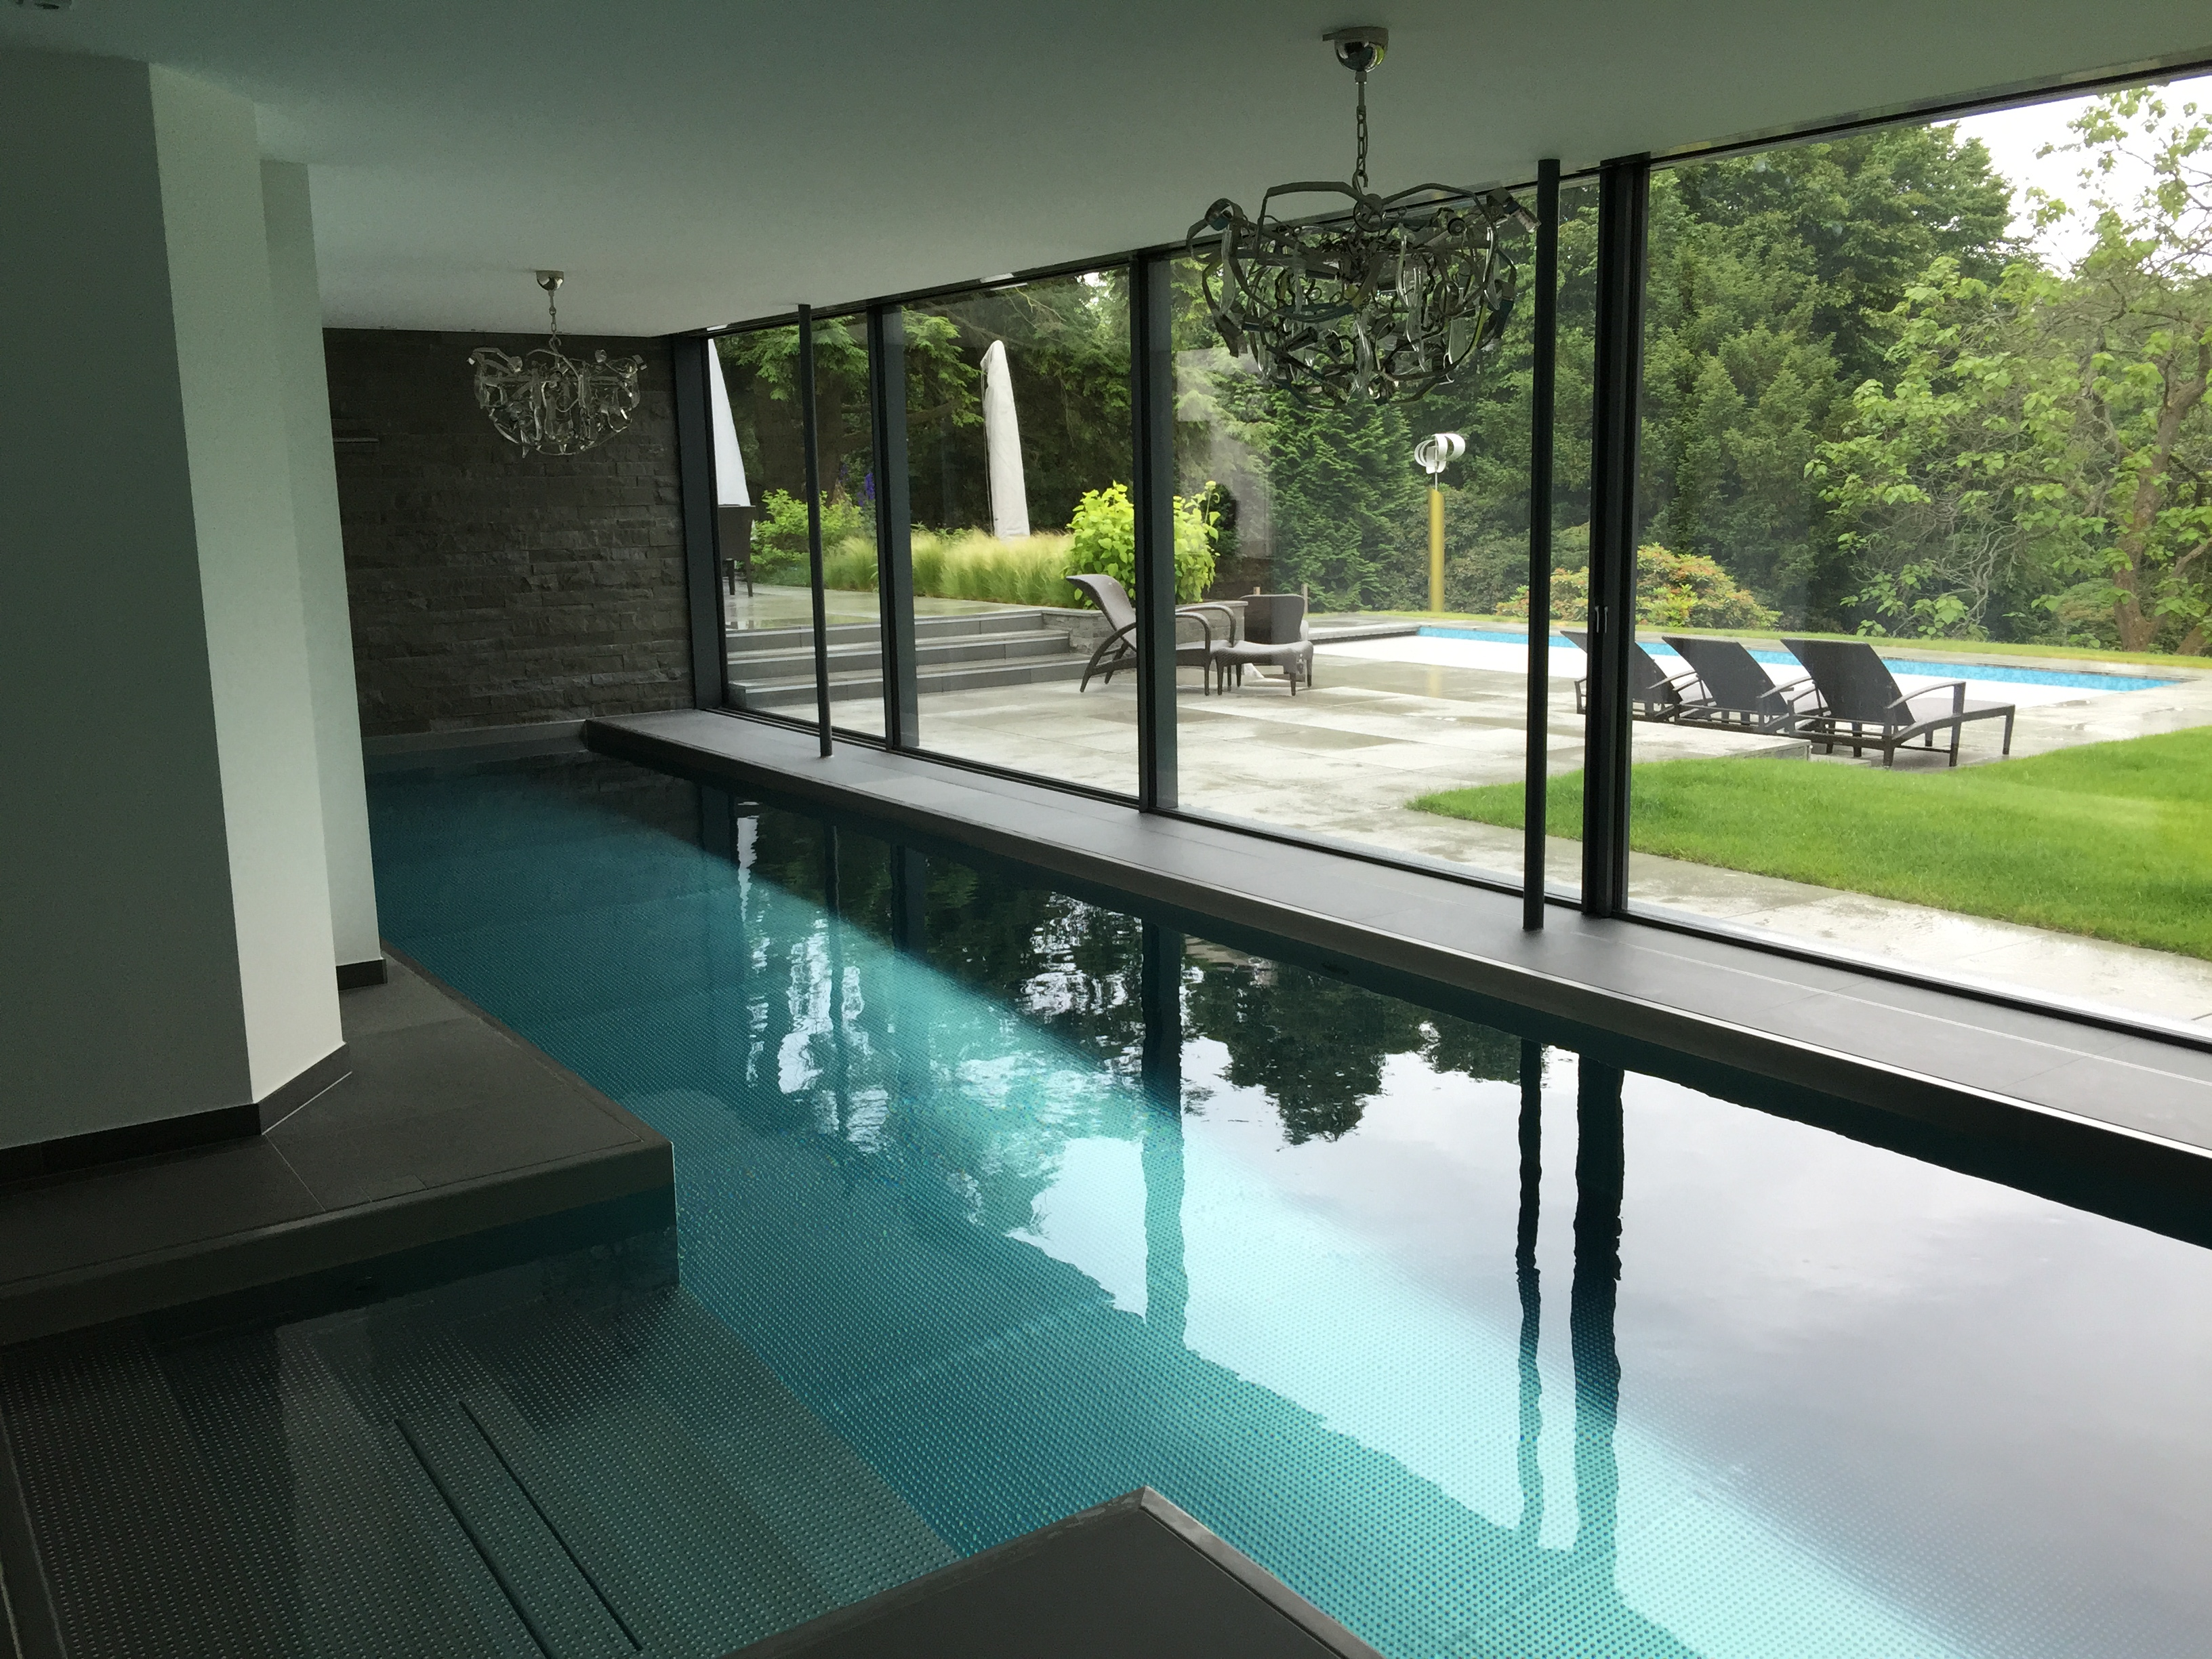 Neubau Indoor-Pool 2015 | Architekturbüro Jürgen Fladung